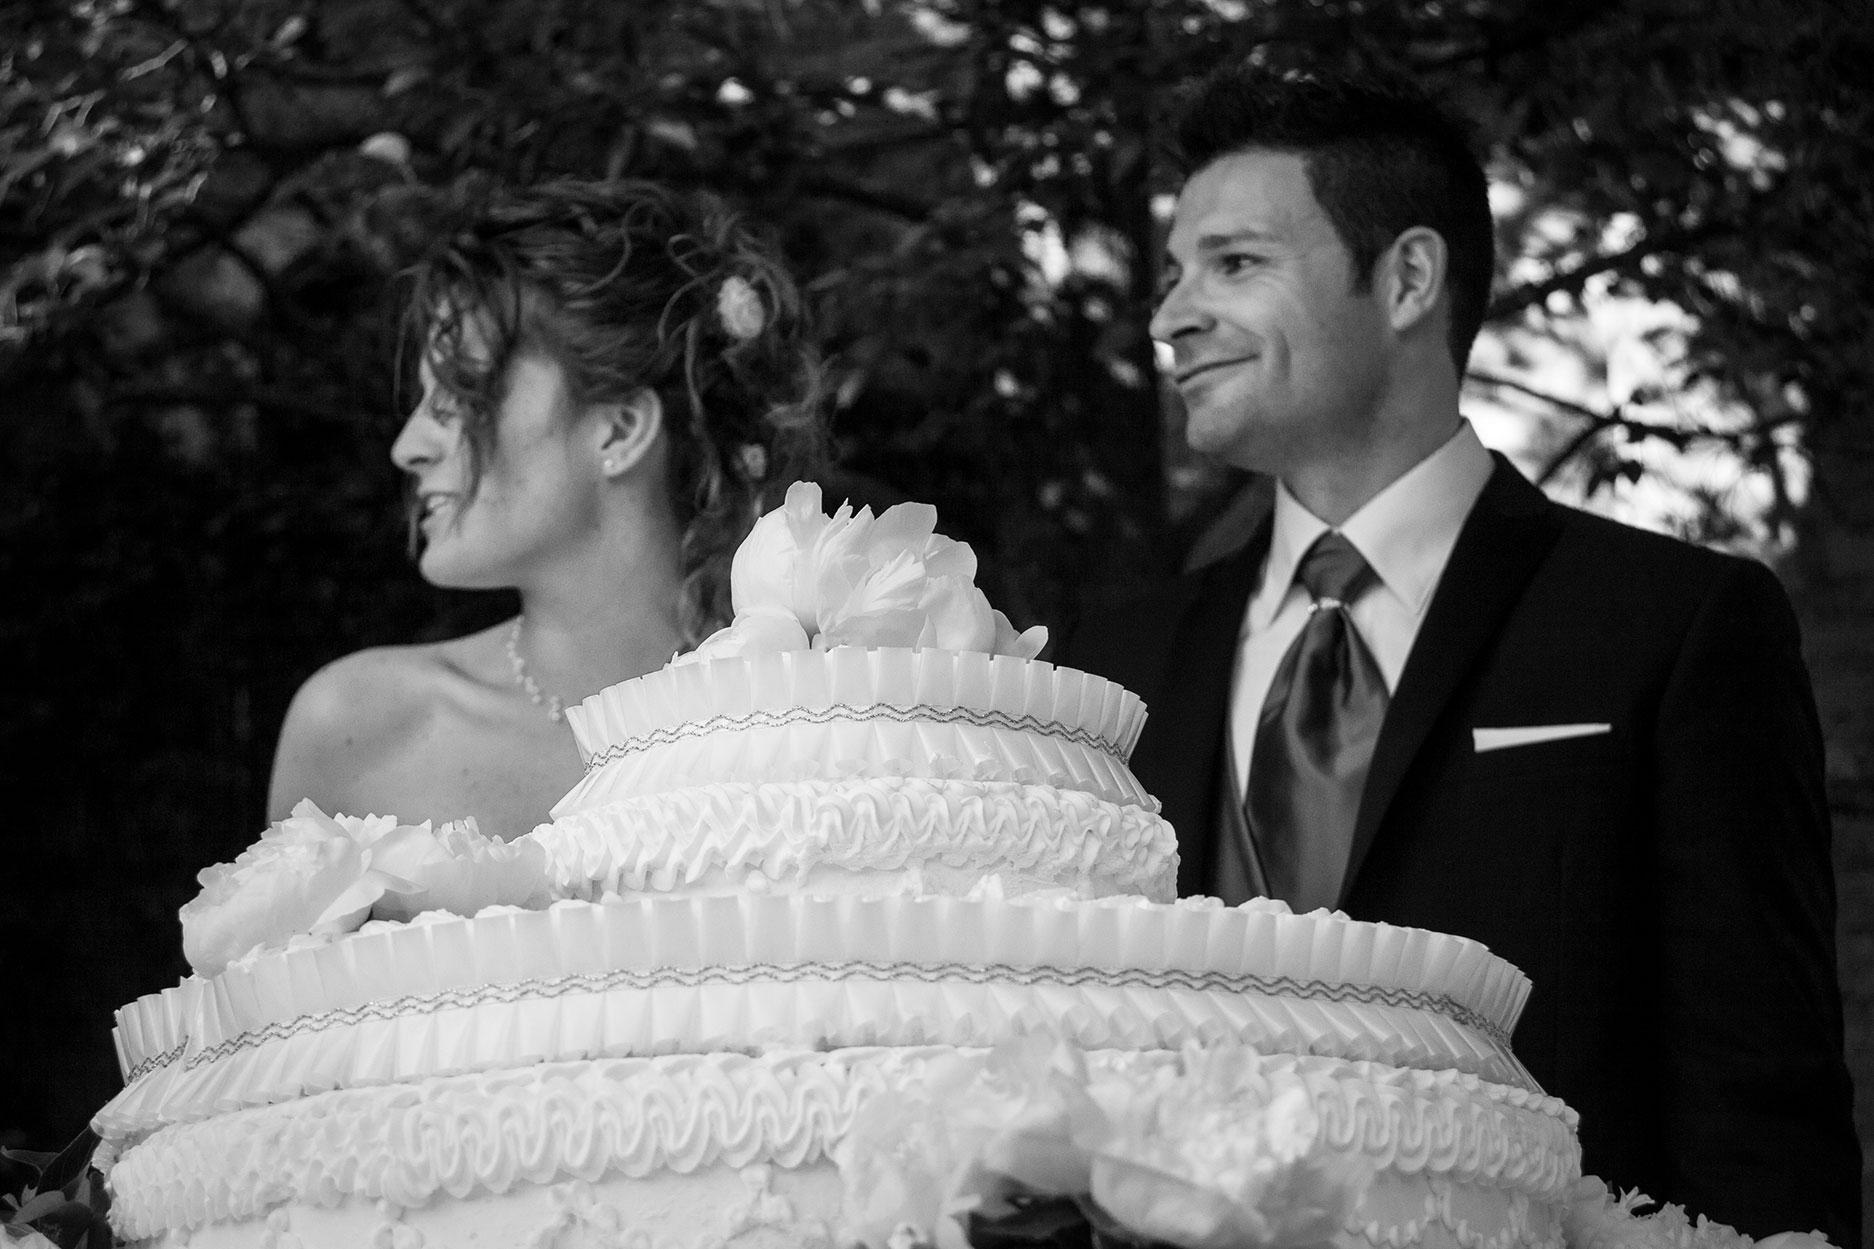 Francesca-Ferrati-wedding-photographer-Verona-Federica-Giovanni29